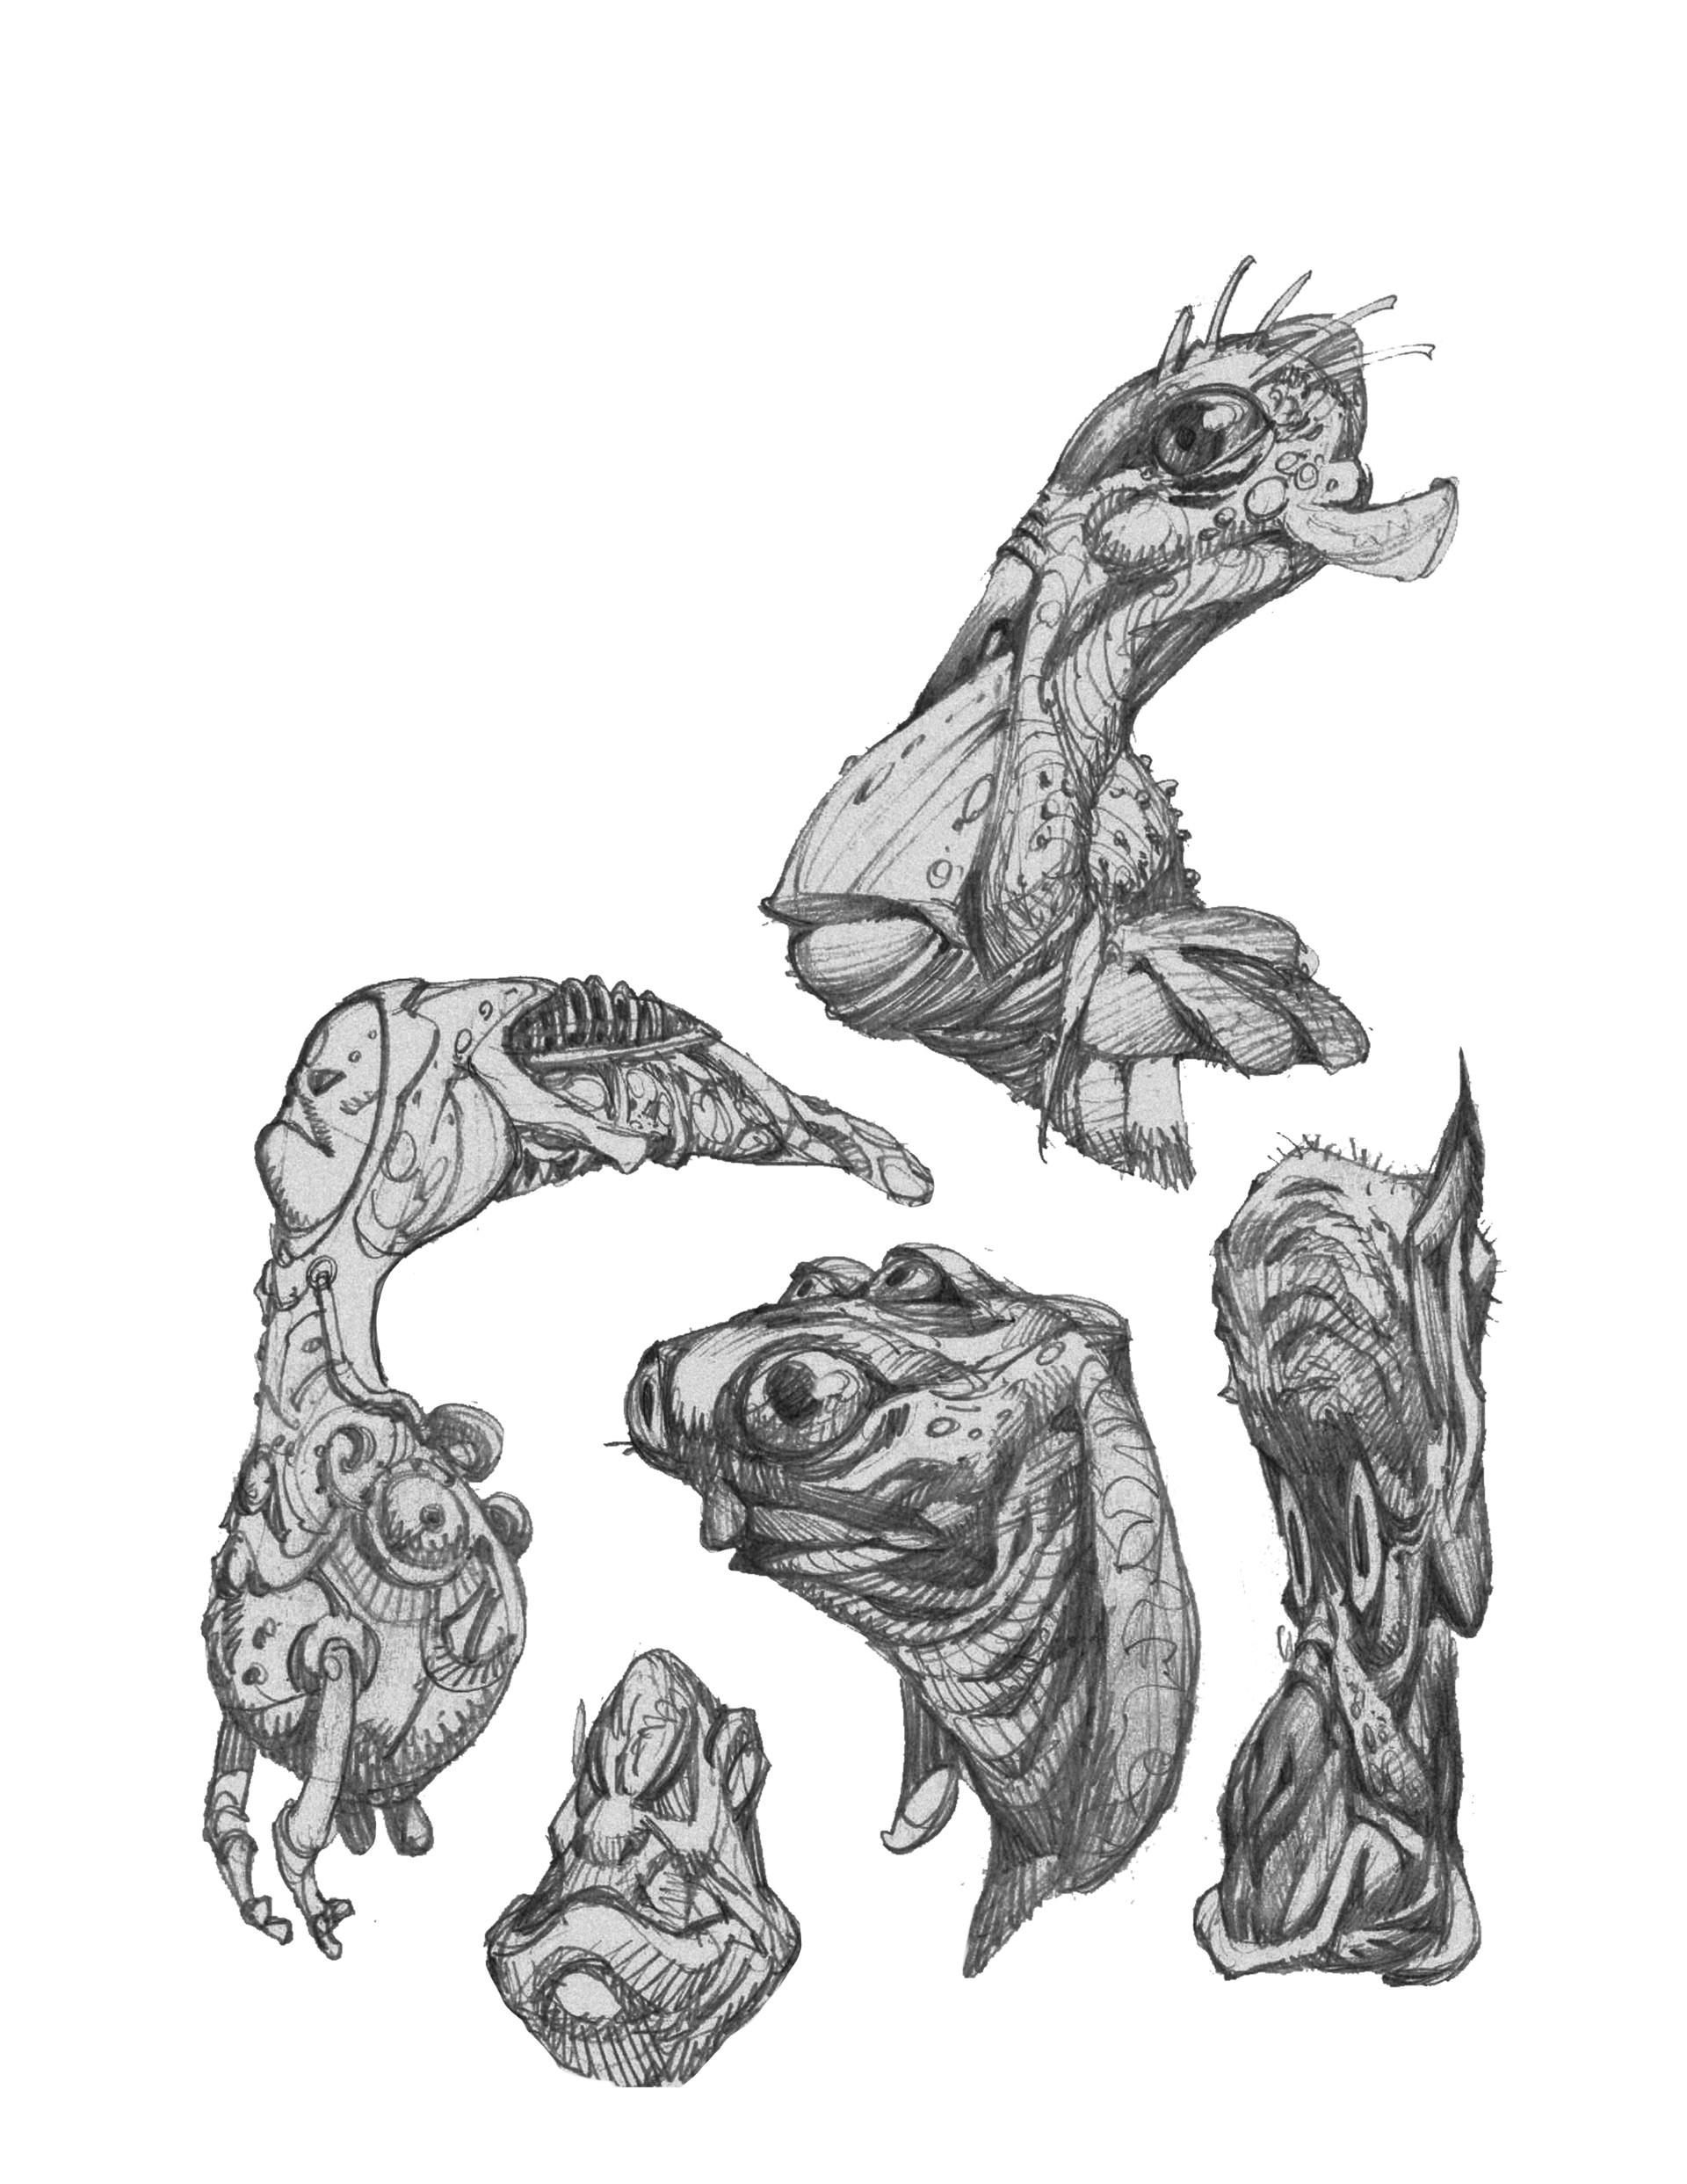 Rustam hasanov rh sketches 3